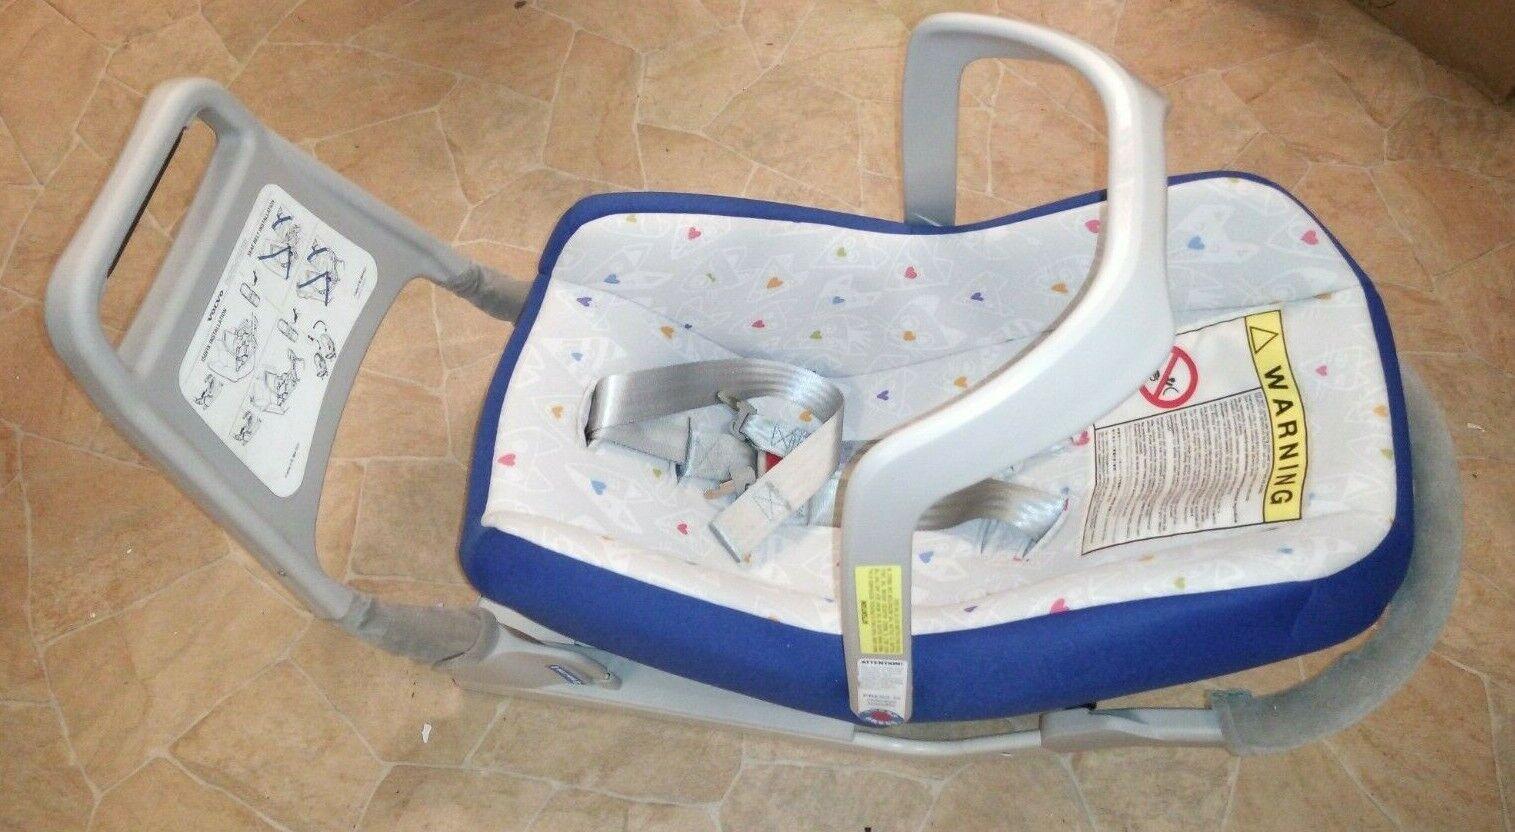 original babyschale 0 10 kg volvo kindersitz mit isofix gestell kinder sitz ebay. Black Bedroom Furniture Sets. Home Design Ideas